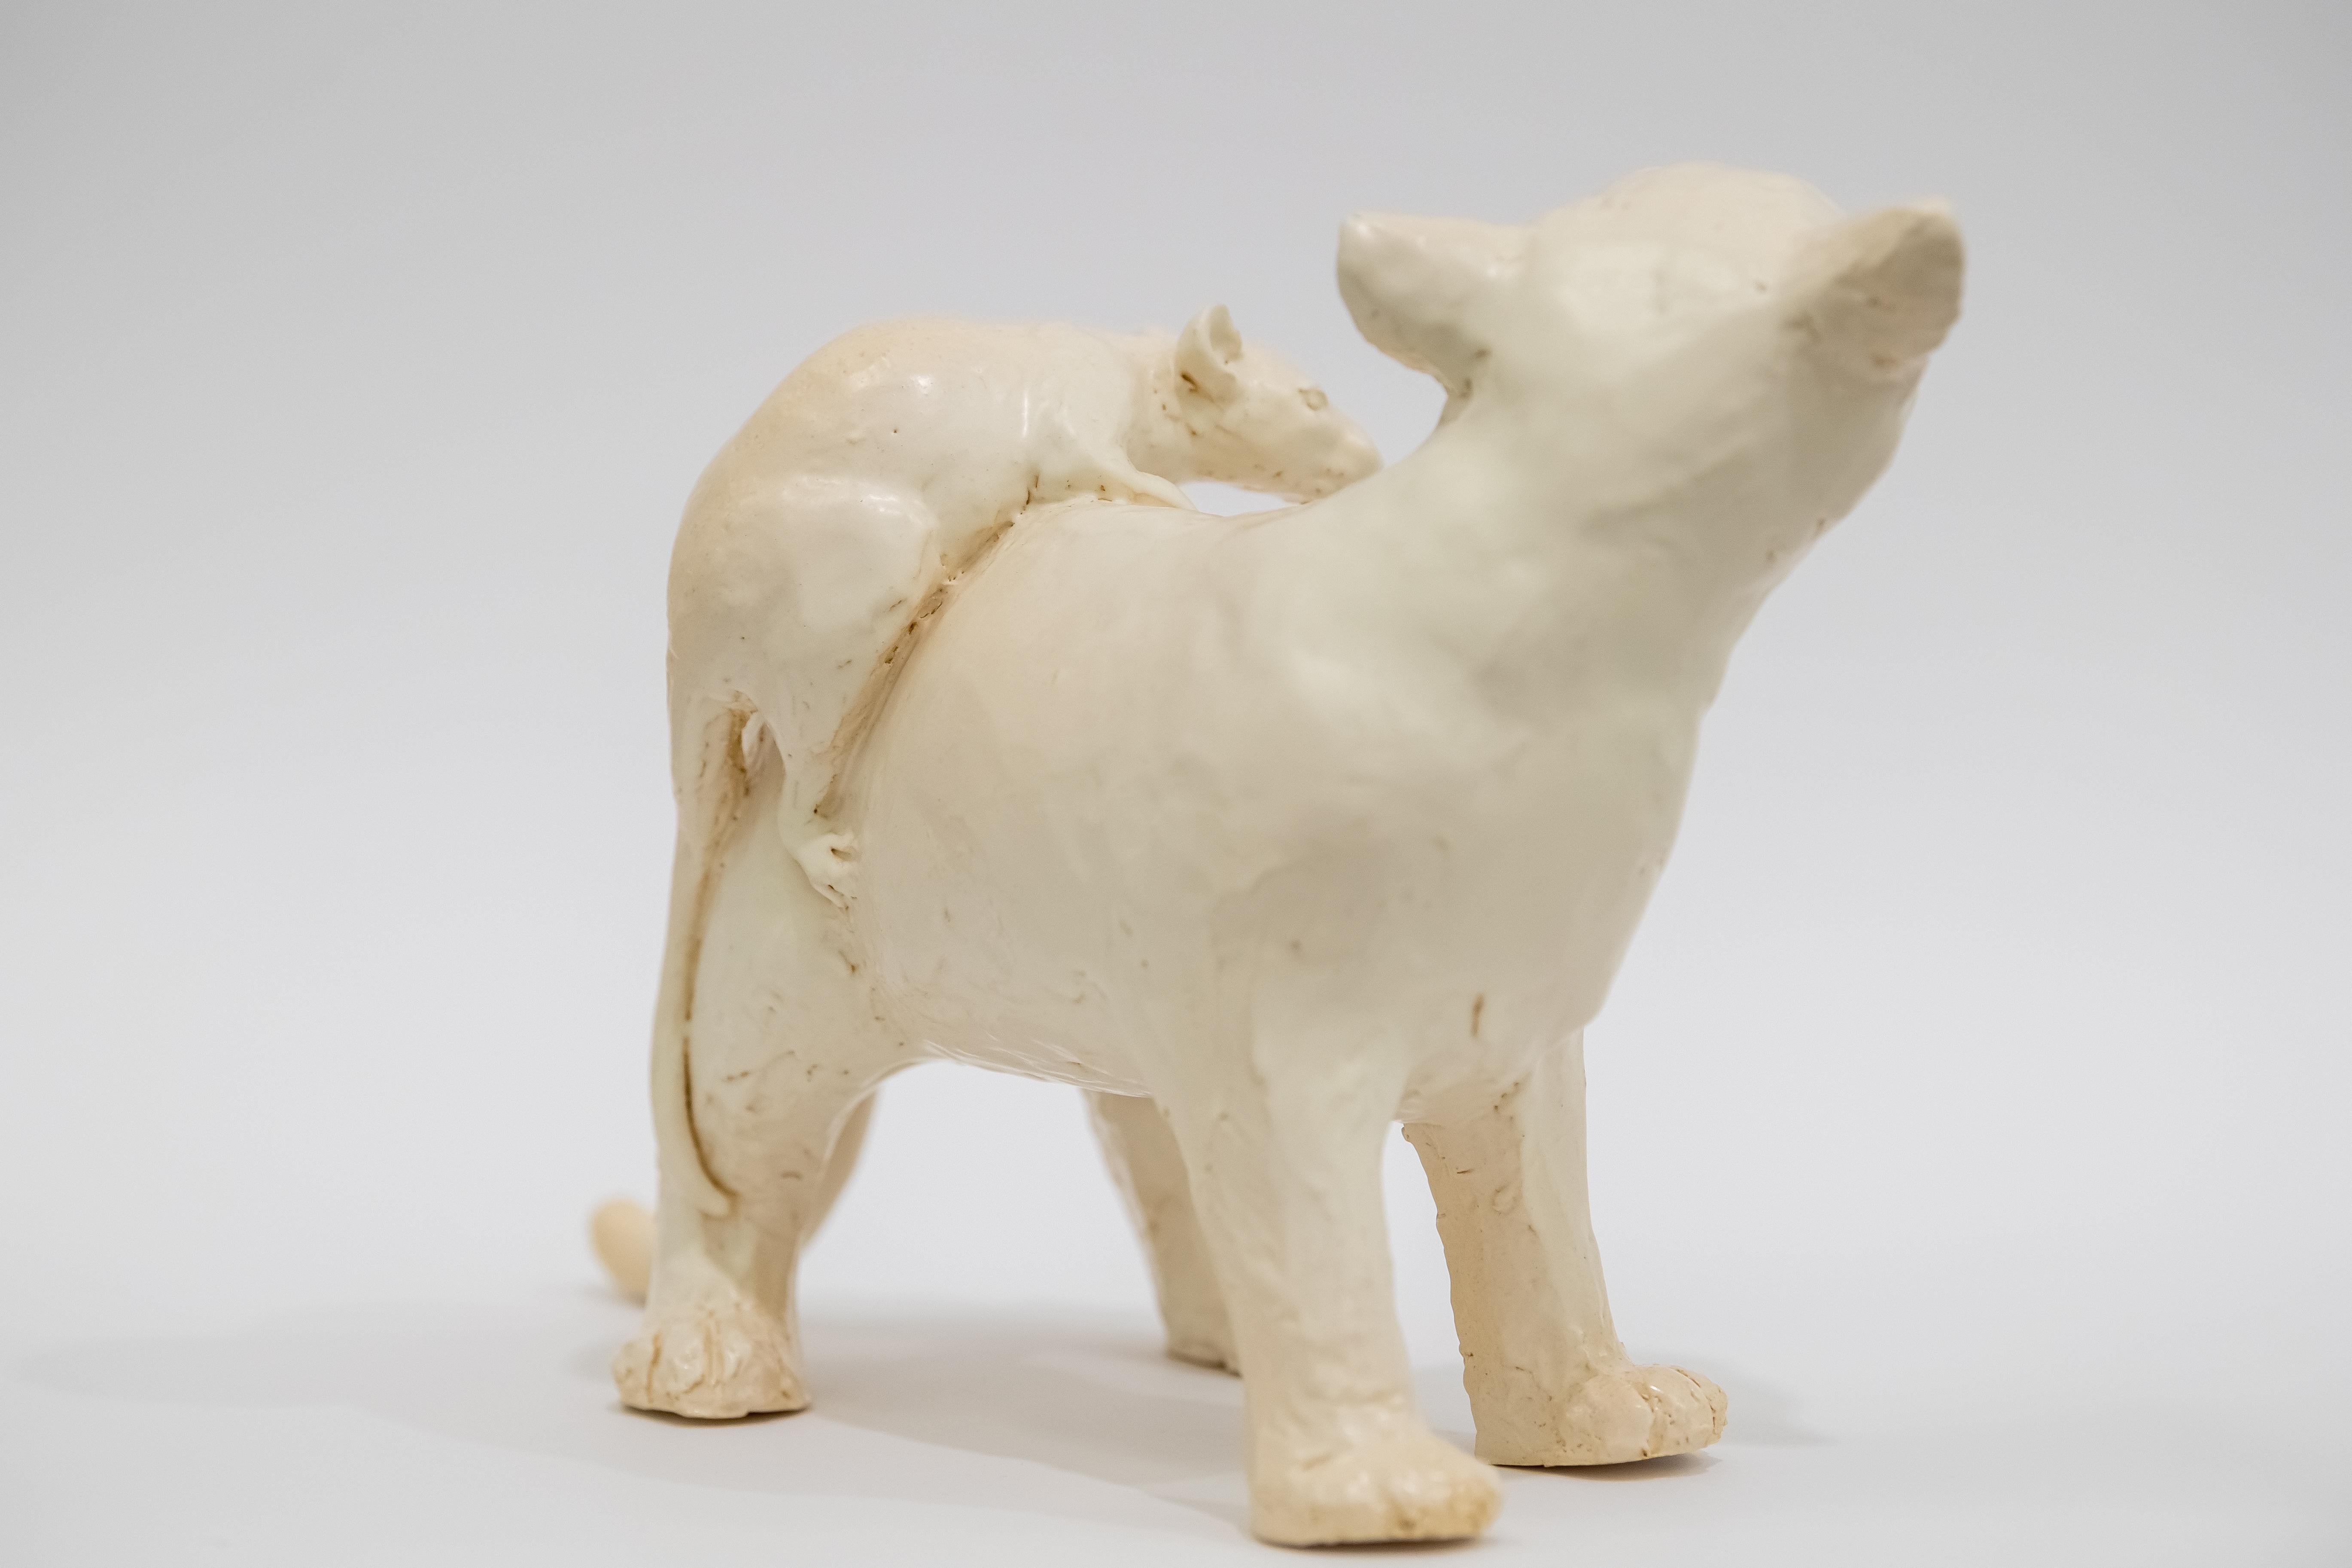 Rat On A Cat - Unique Handmade Glazed Ceramics Sculpture, Animals Portrait